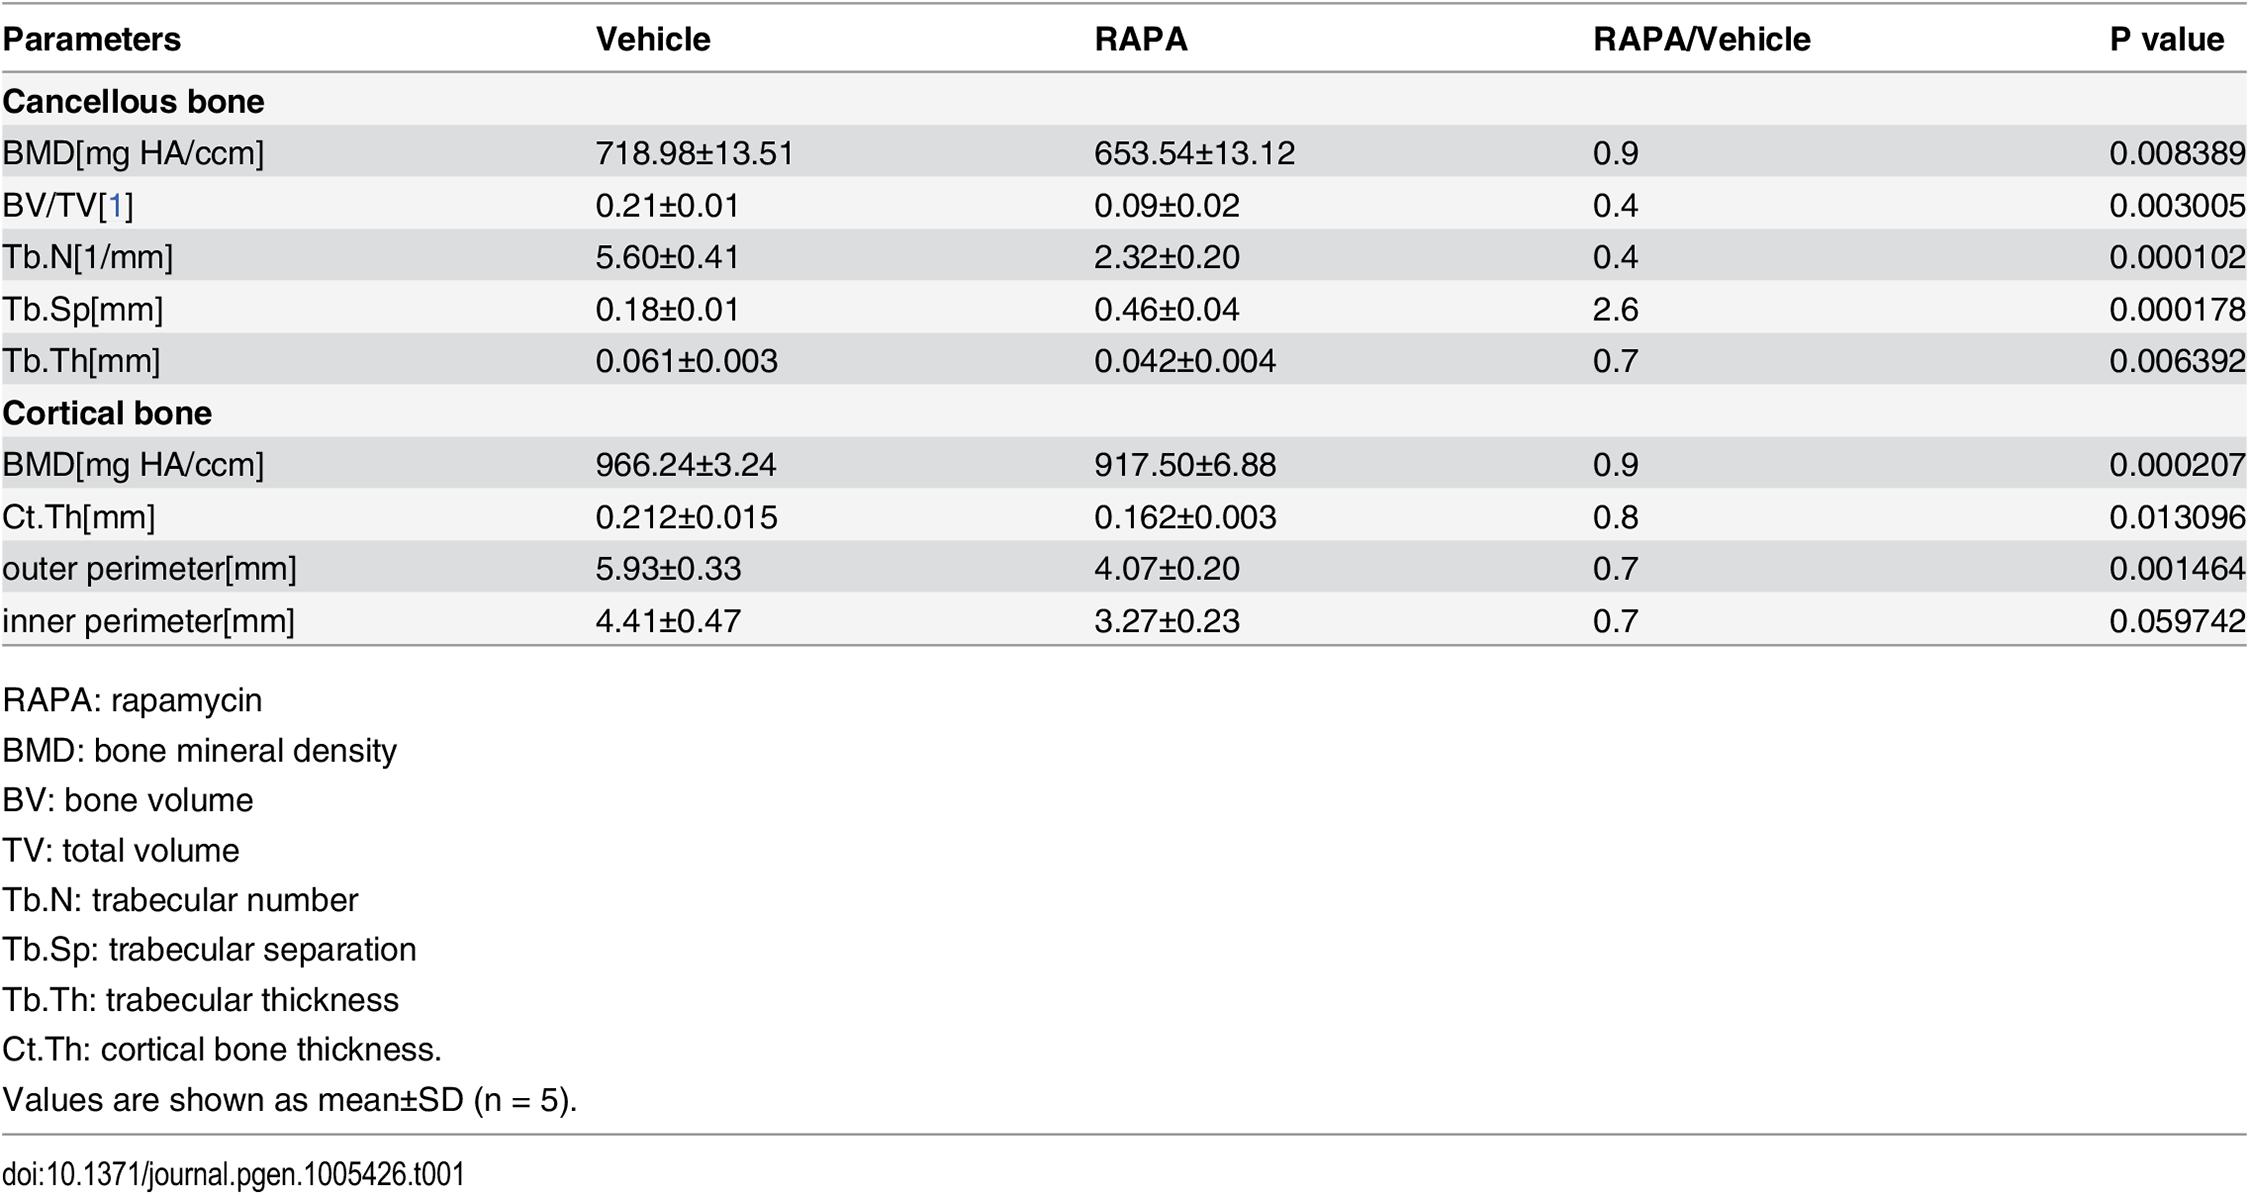 Micro CT analysis of rapamycin-treated C57BL/6 mice at 10 weeks of age.